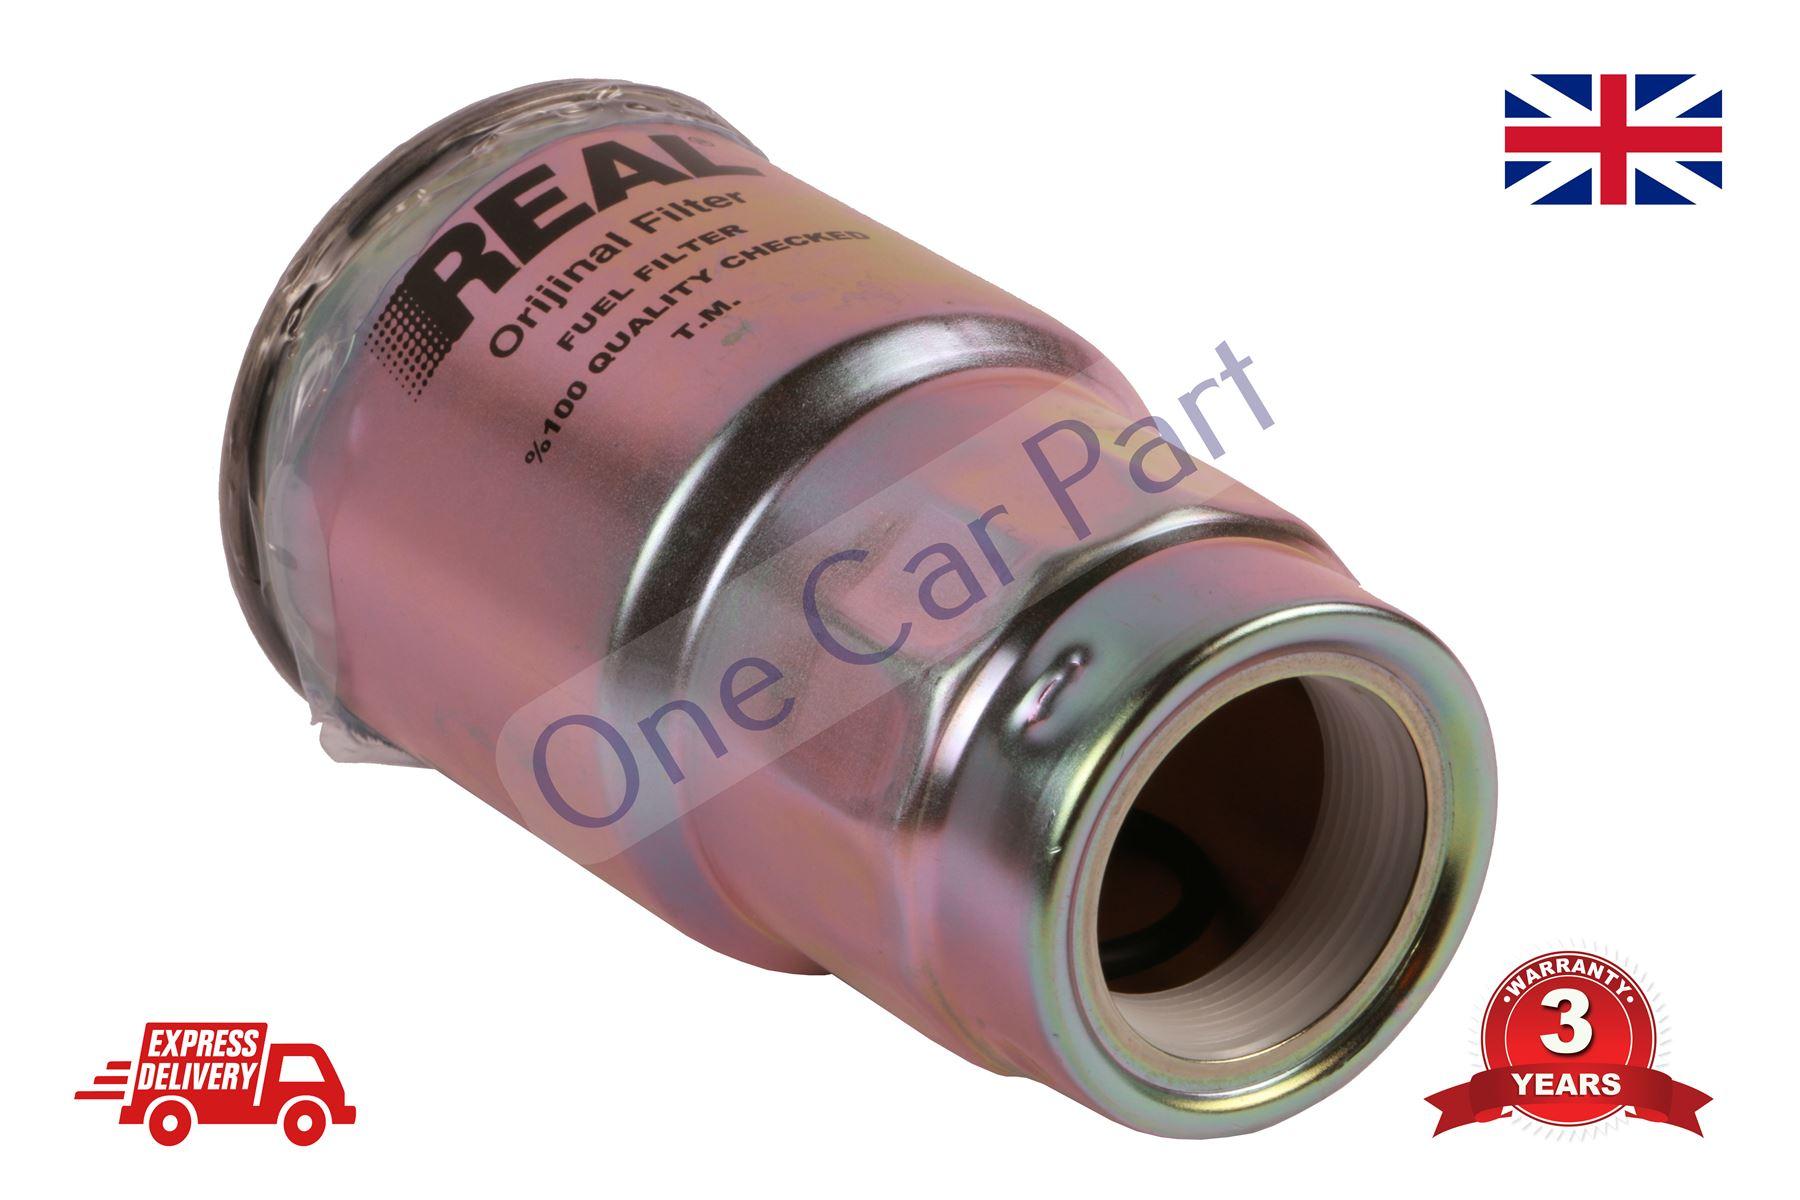 Fuel Filter Wk720 2x Mazda 323 F Mk6 Toyota Avensis Corolla